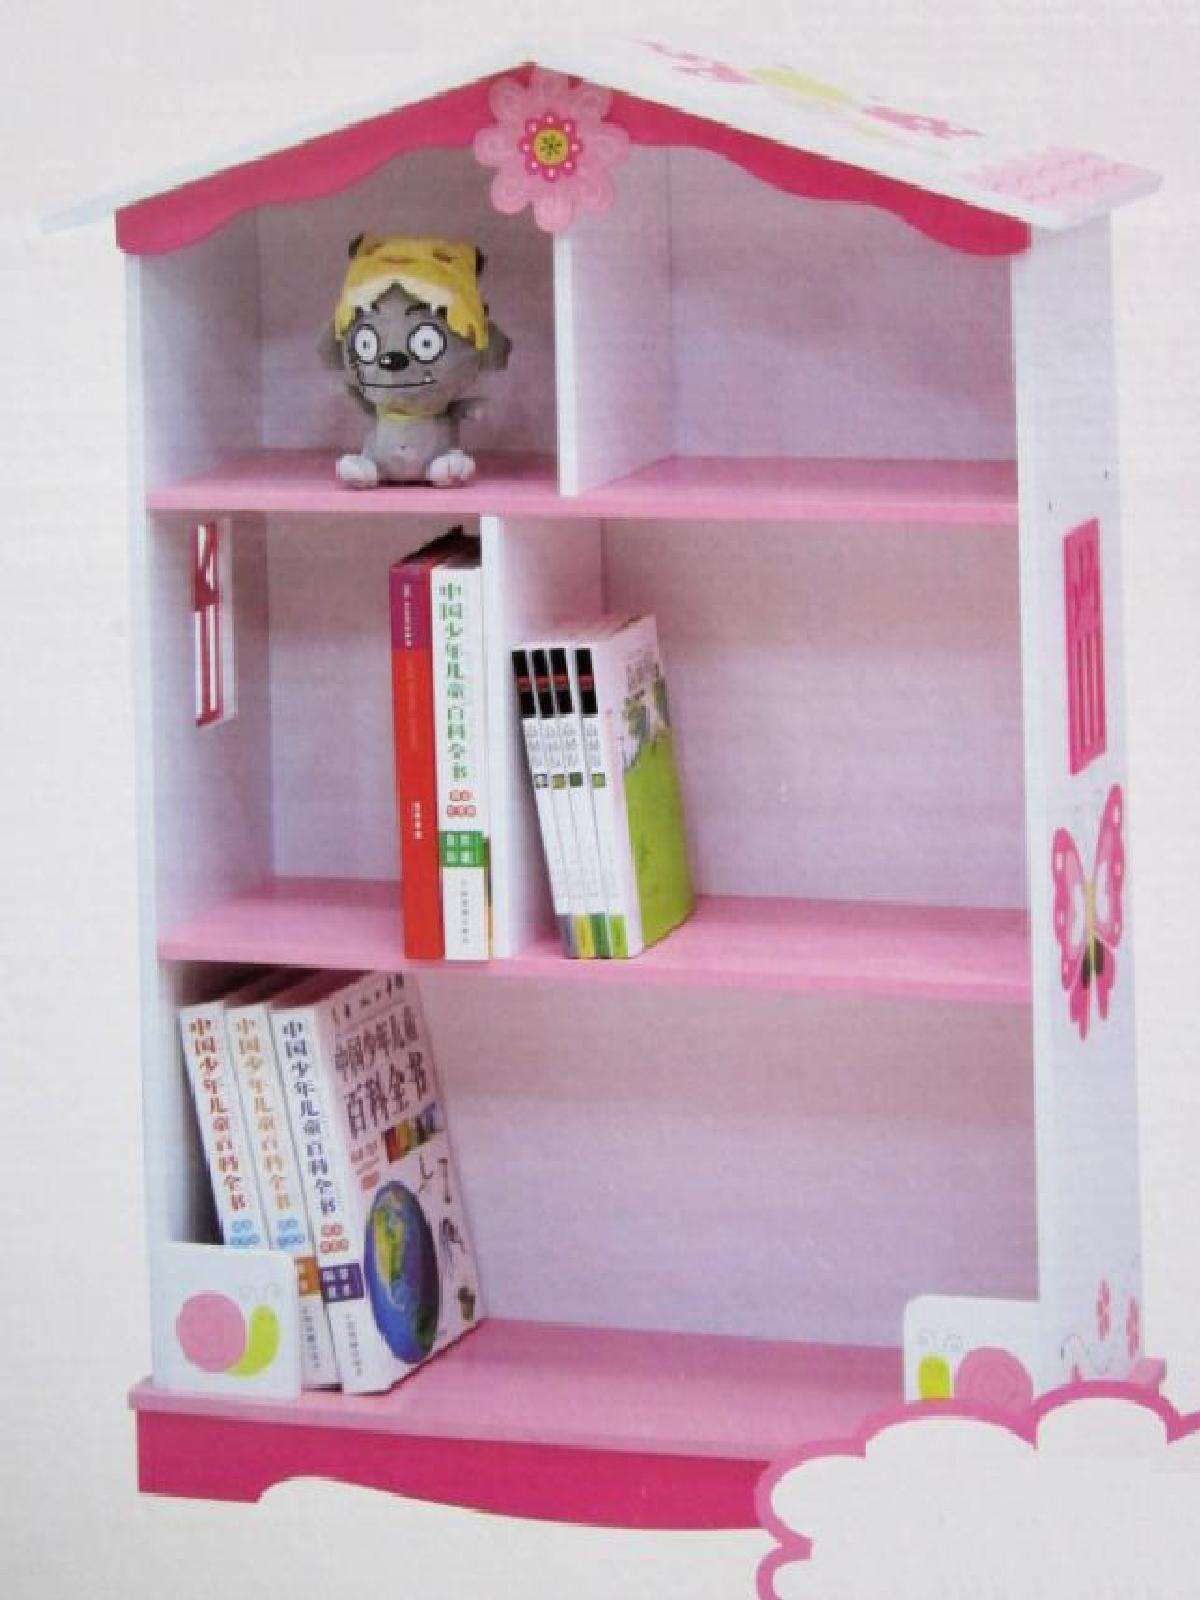 Xiaomulang Butterflies And Flowers Dolls House Shaped Bookshelf Last